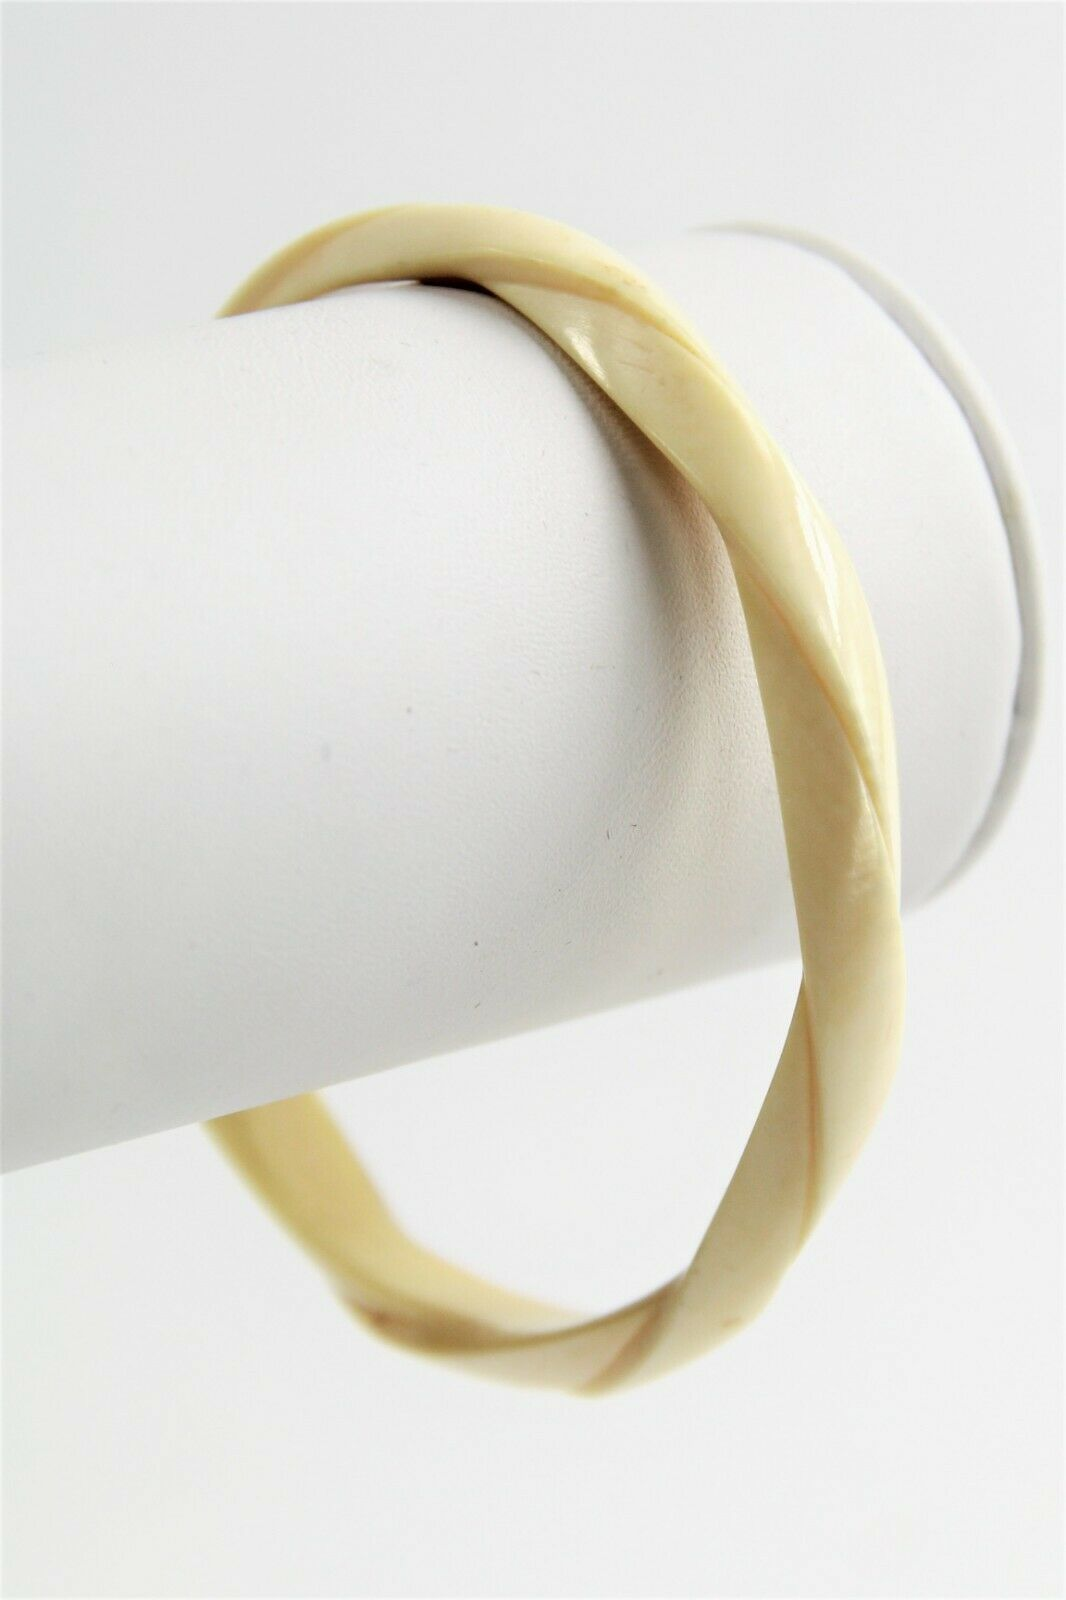 "6.5"" ANTIQUE ESTATE Jewelry BOHO TRIBAL HAND CARVED TWIST BANGLE BRACELET"